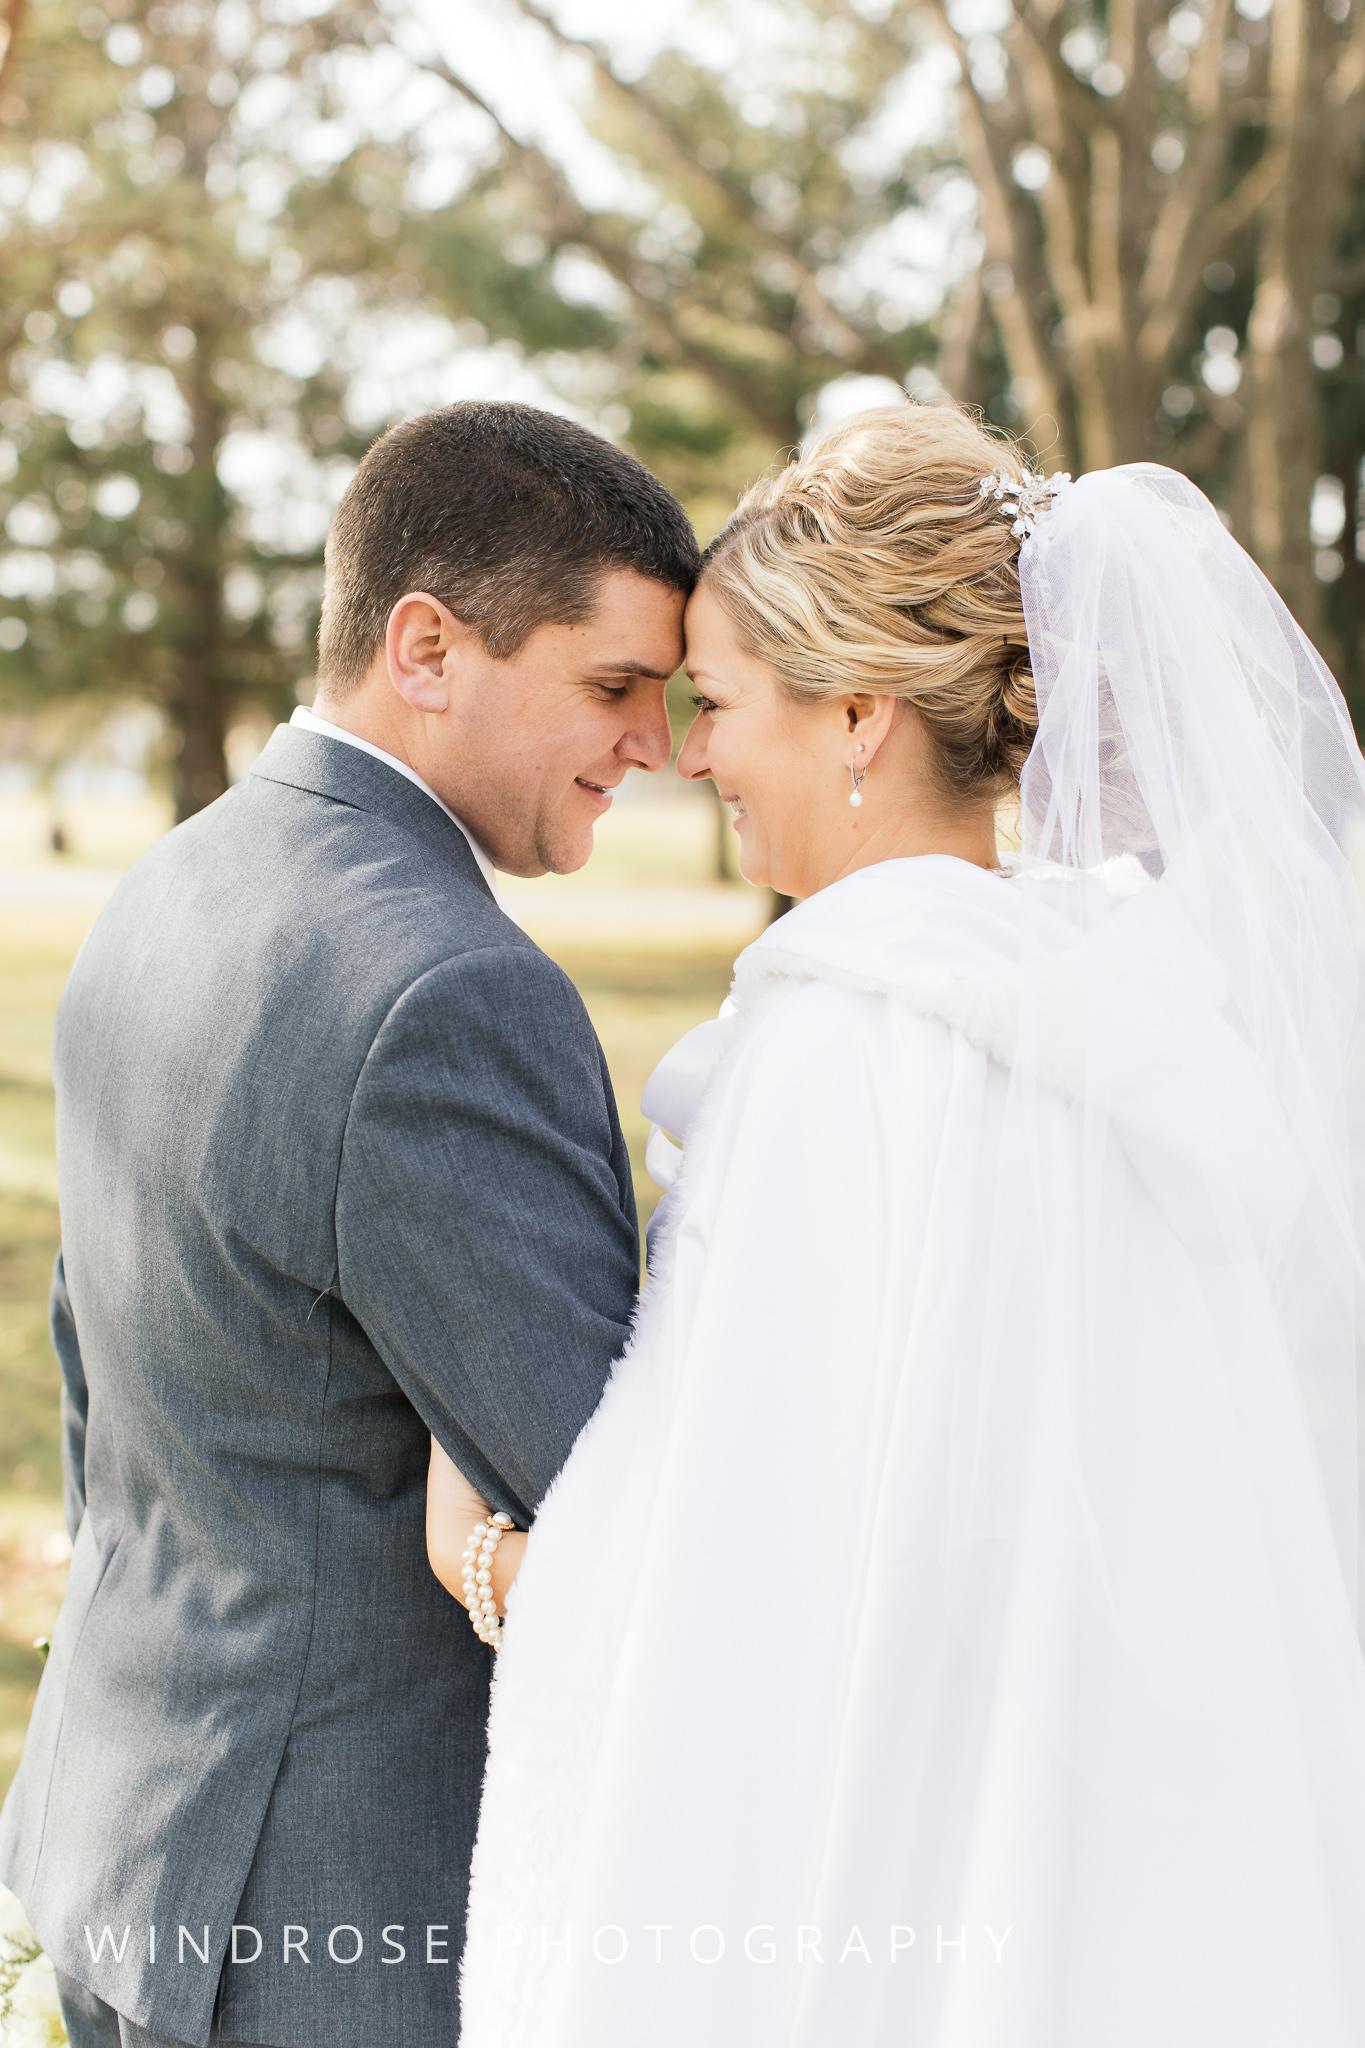 Rochester-MN-Wedding-Photo-15.jpg